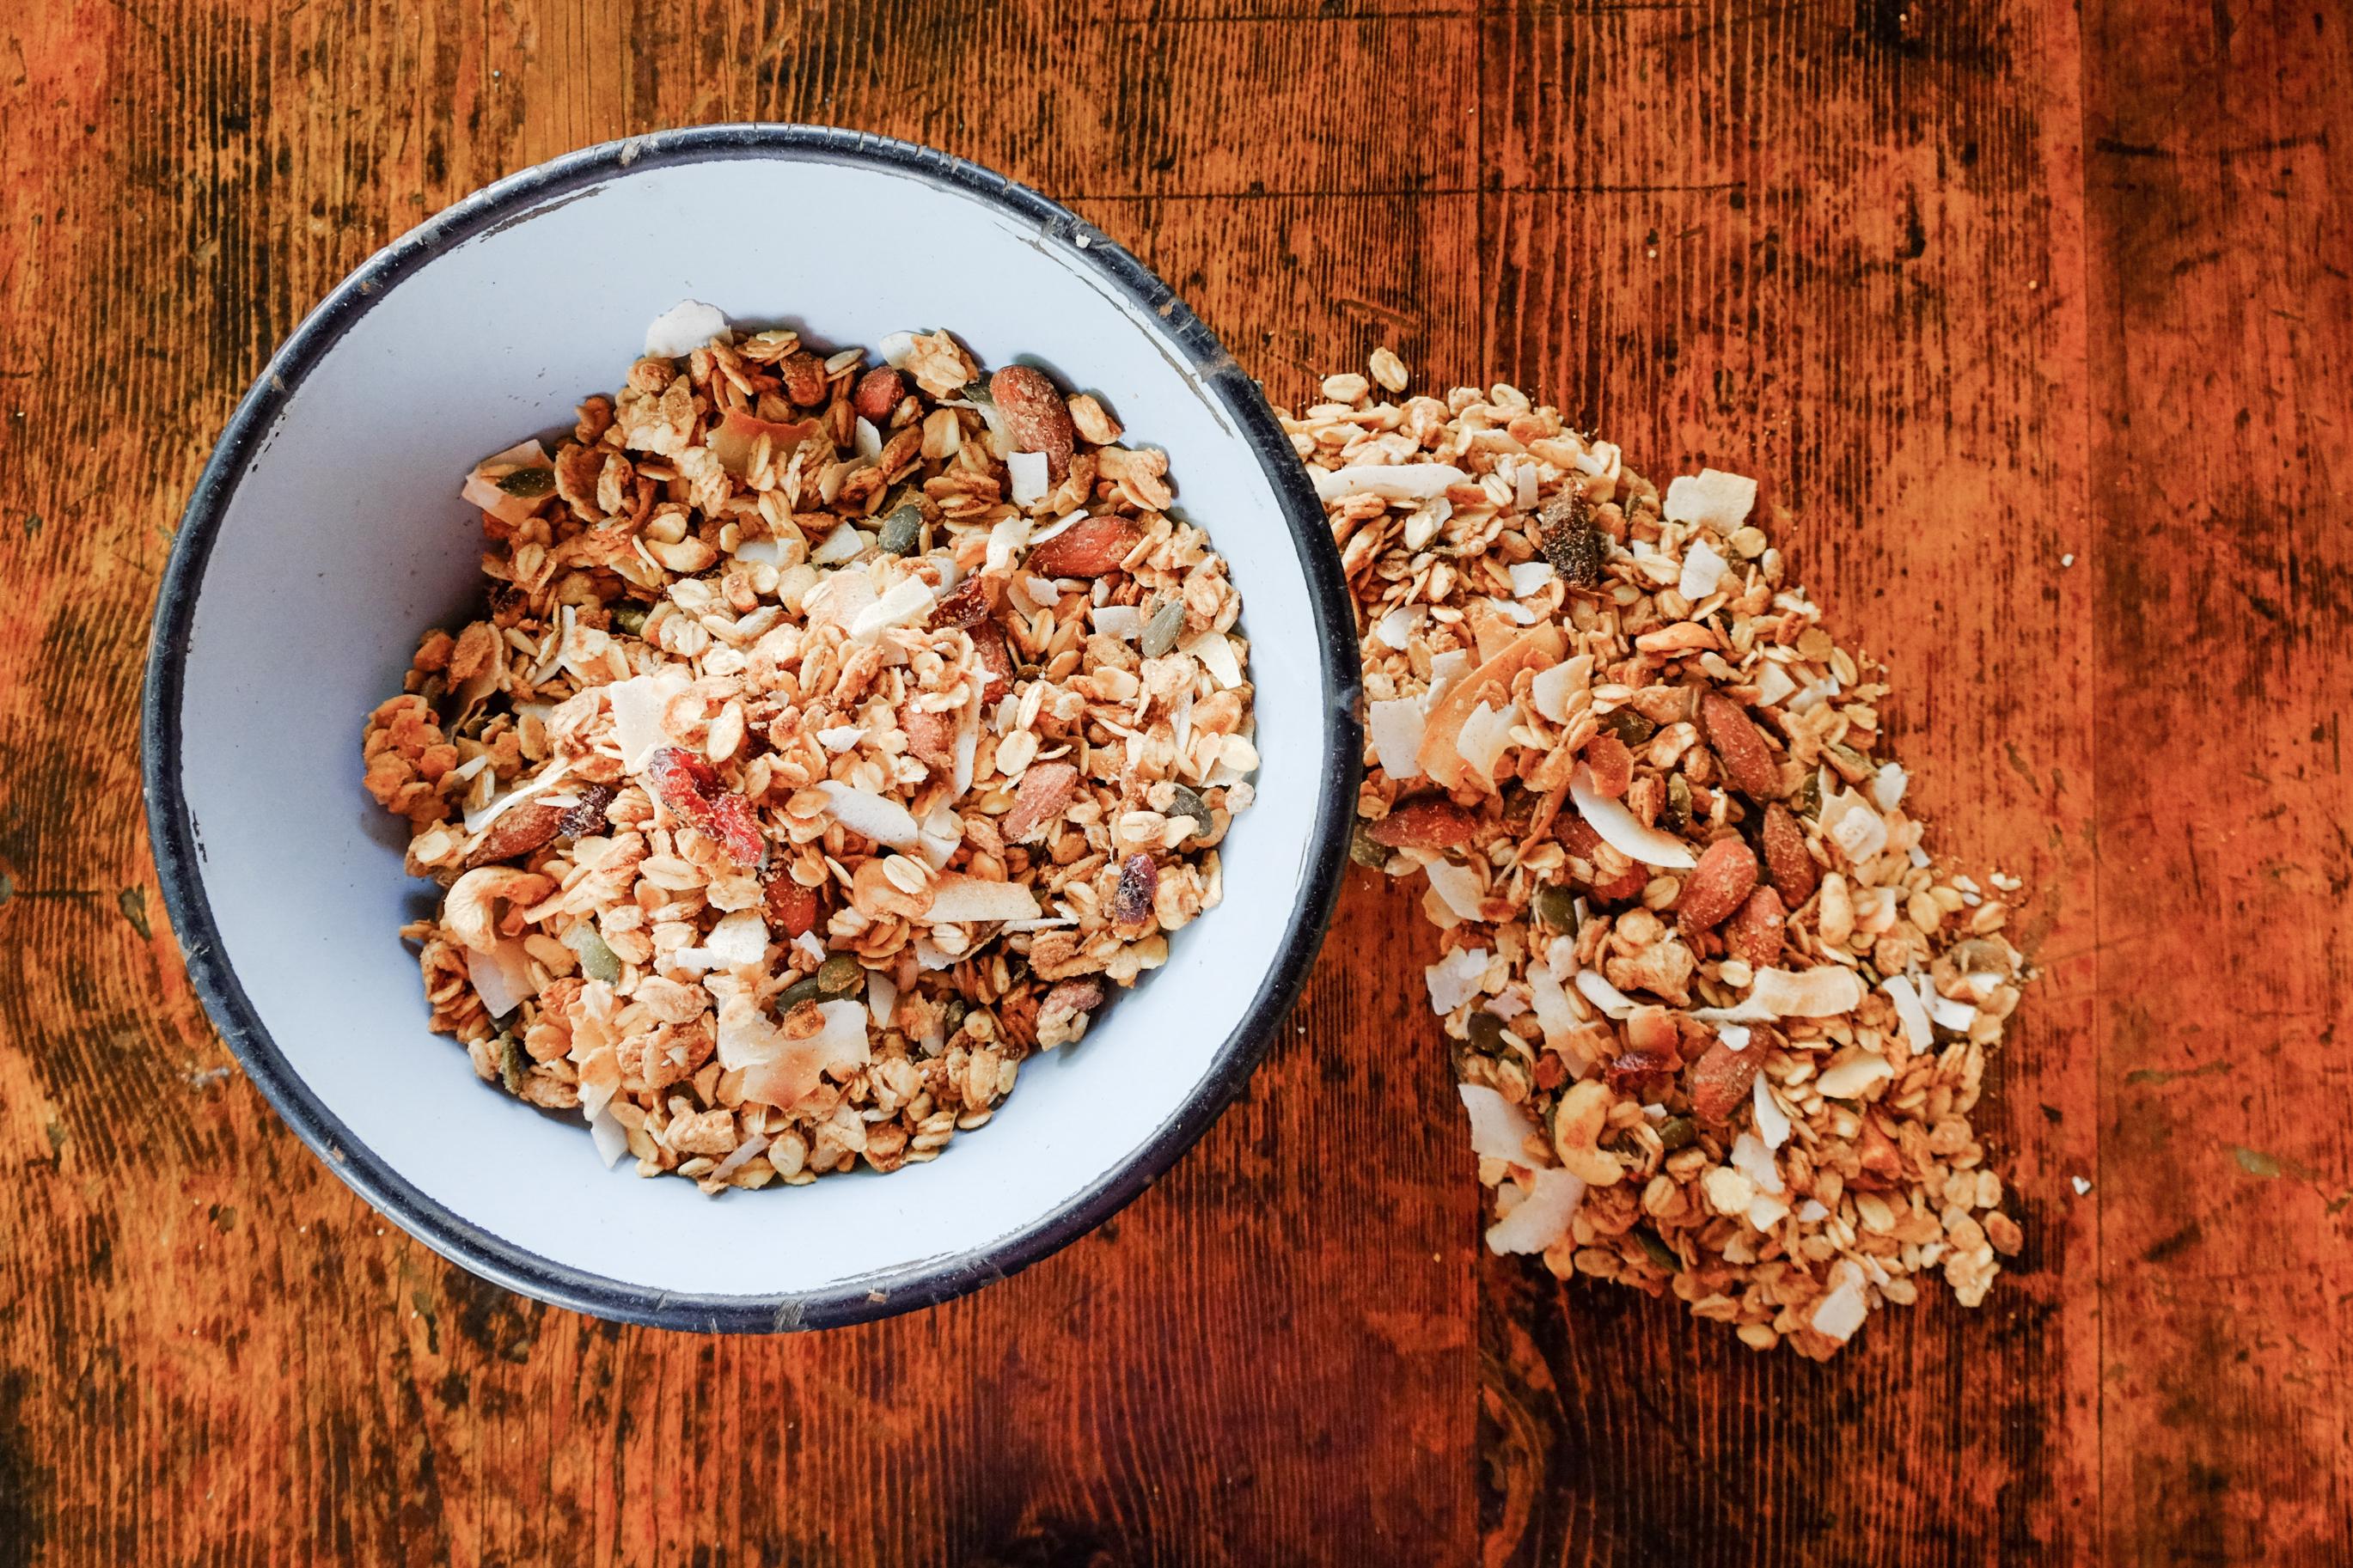 Granola - Peanut butter